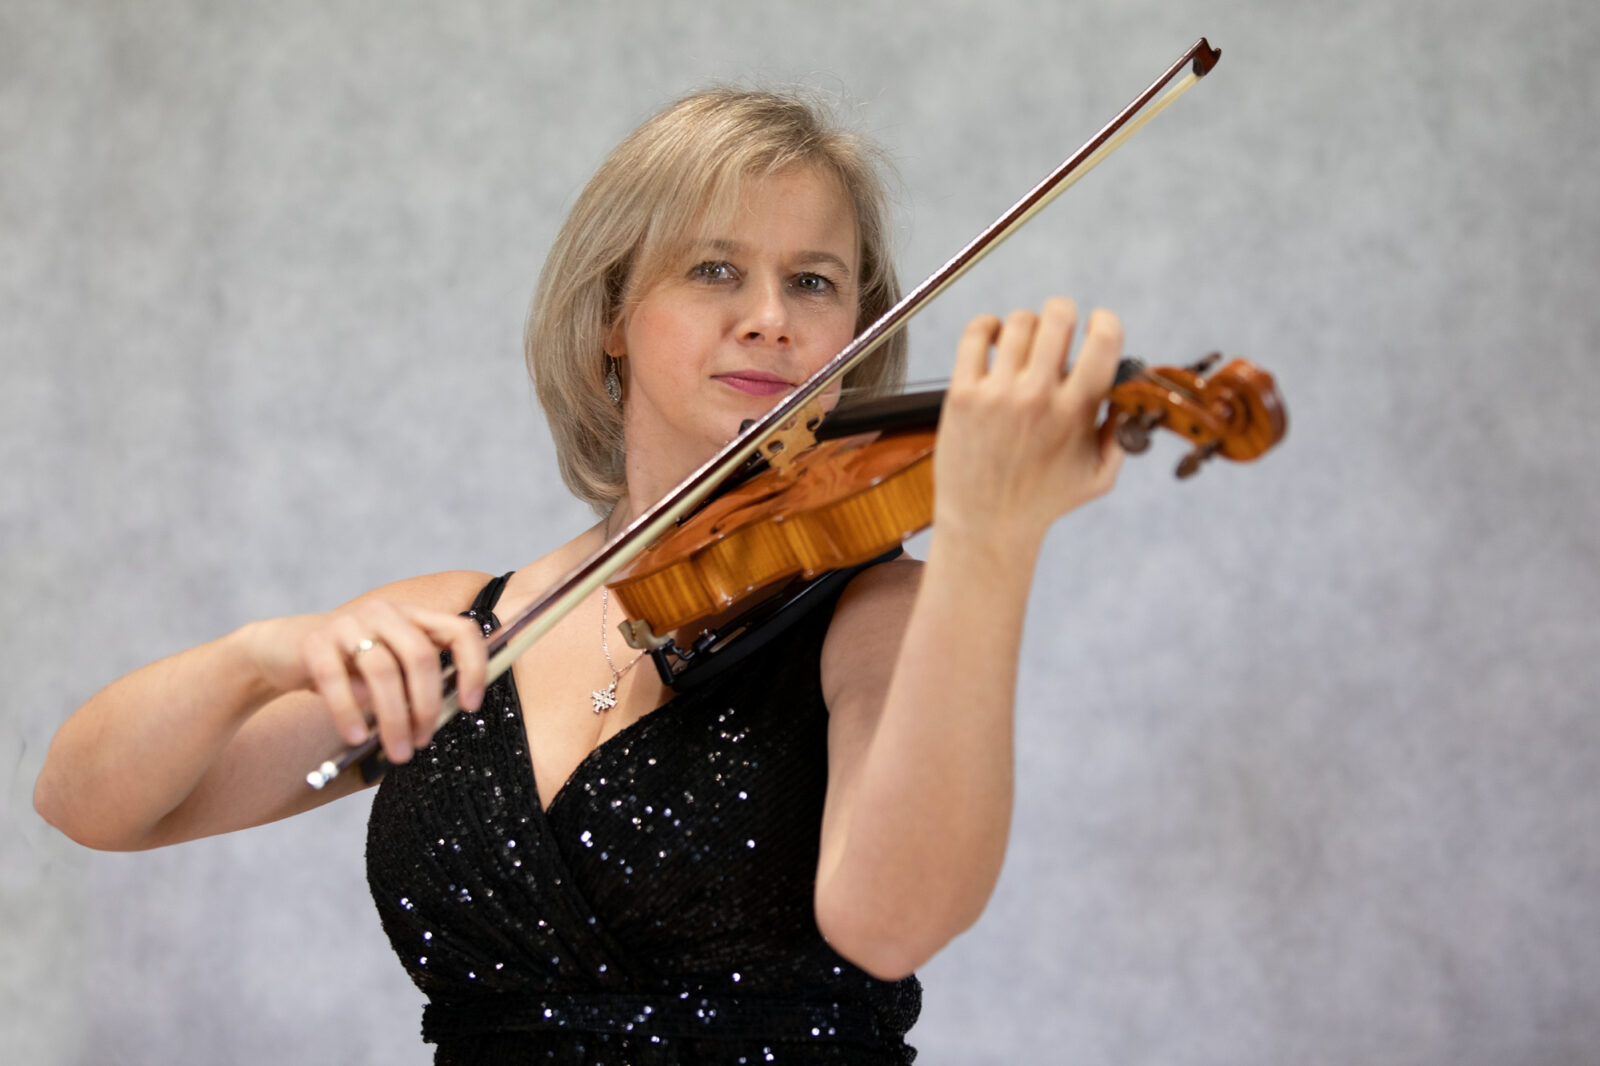 Anna Kaczmarek